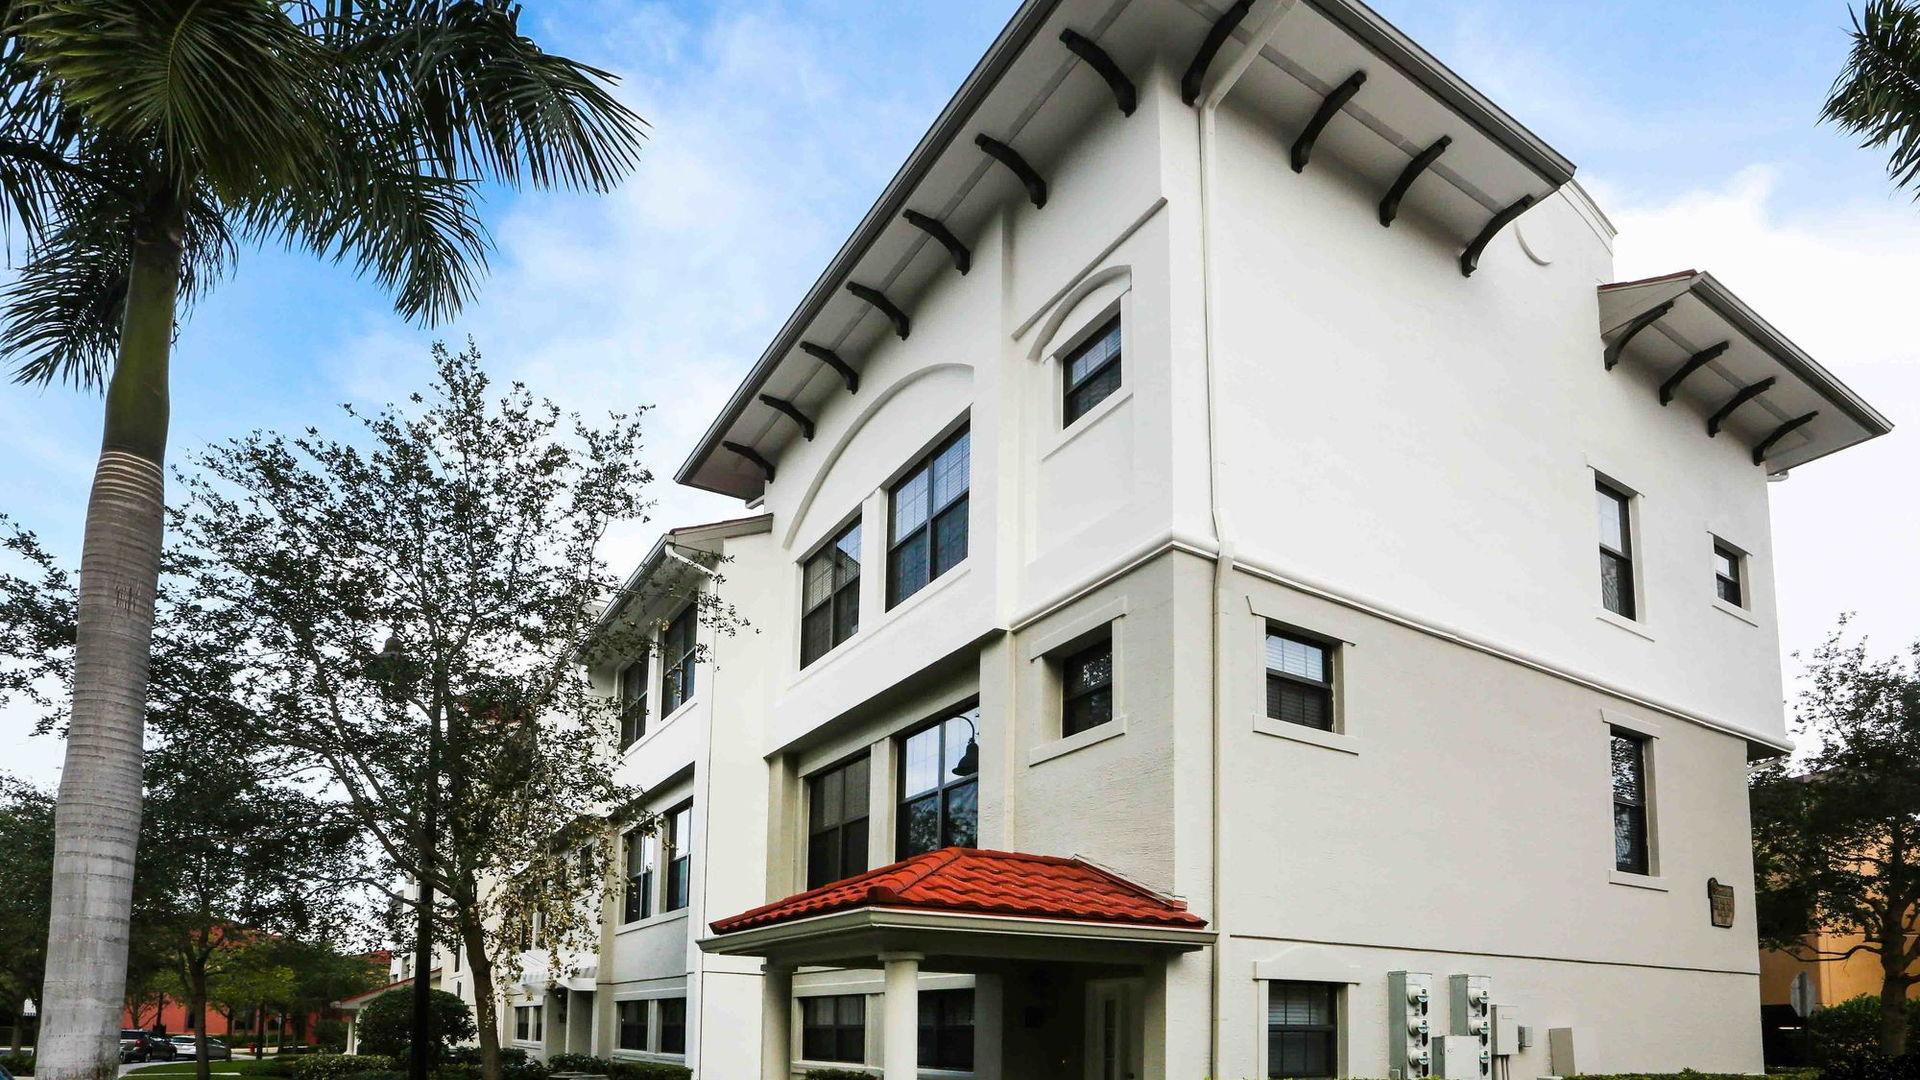 59 Apartments for Rent in Boynton Beach, FL   ApartmentRatings©